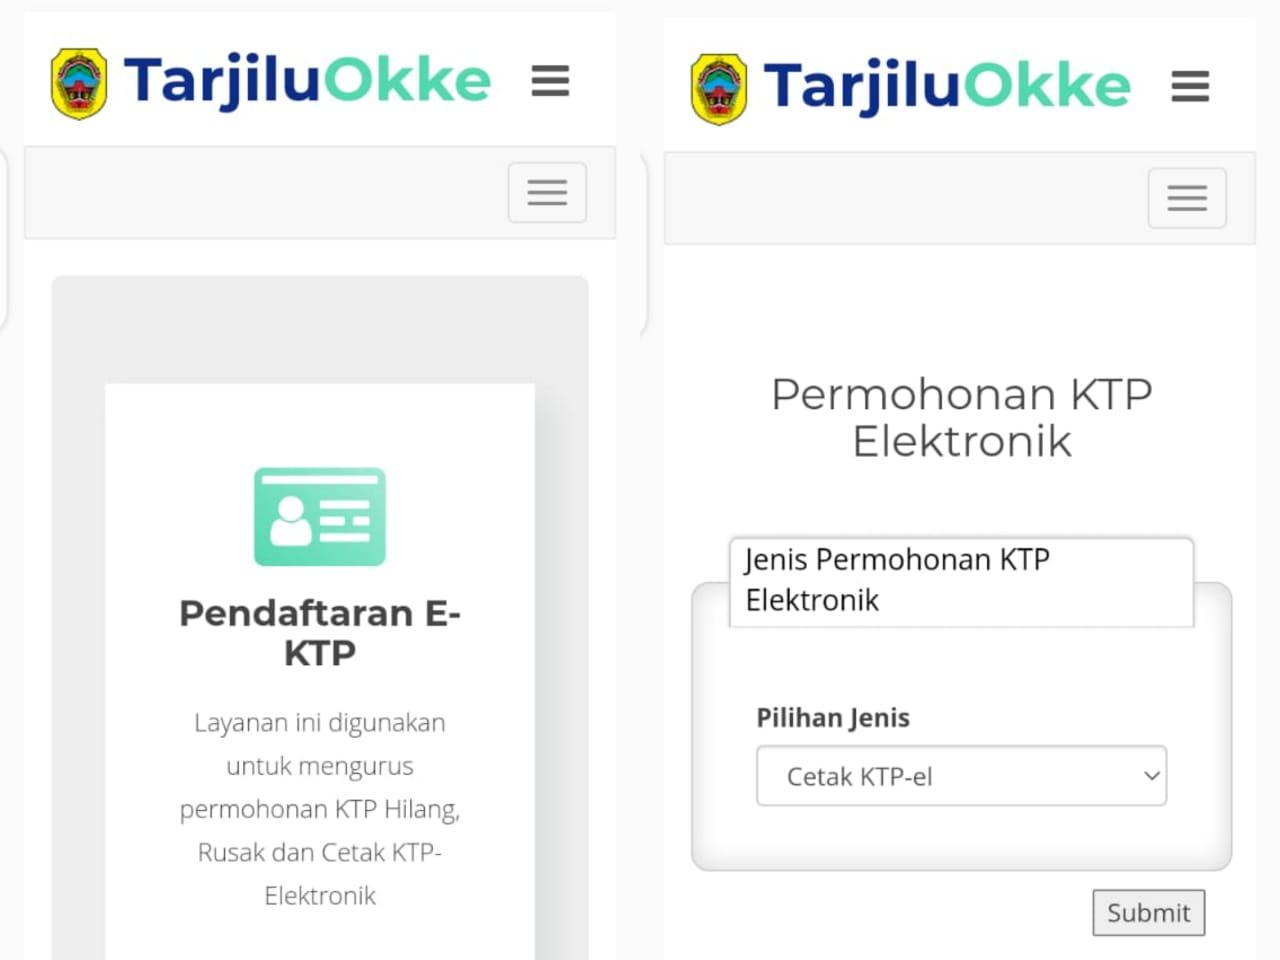 APLIKASI: Tampilan aplikasi Tarjilu Okke milik Dinas Kependudukan dan Pecatatan Sipil (Disdukcapil) Kabupaten Pati. (ISTIMEWA/LINGKAR.CO)